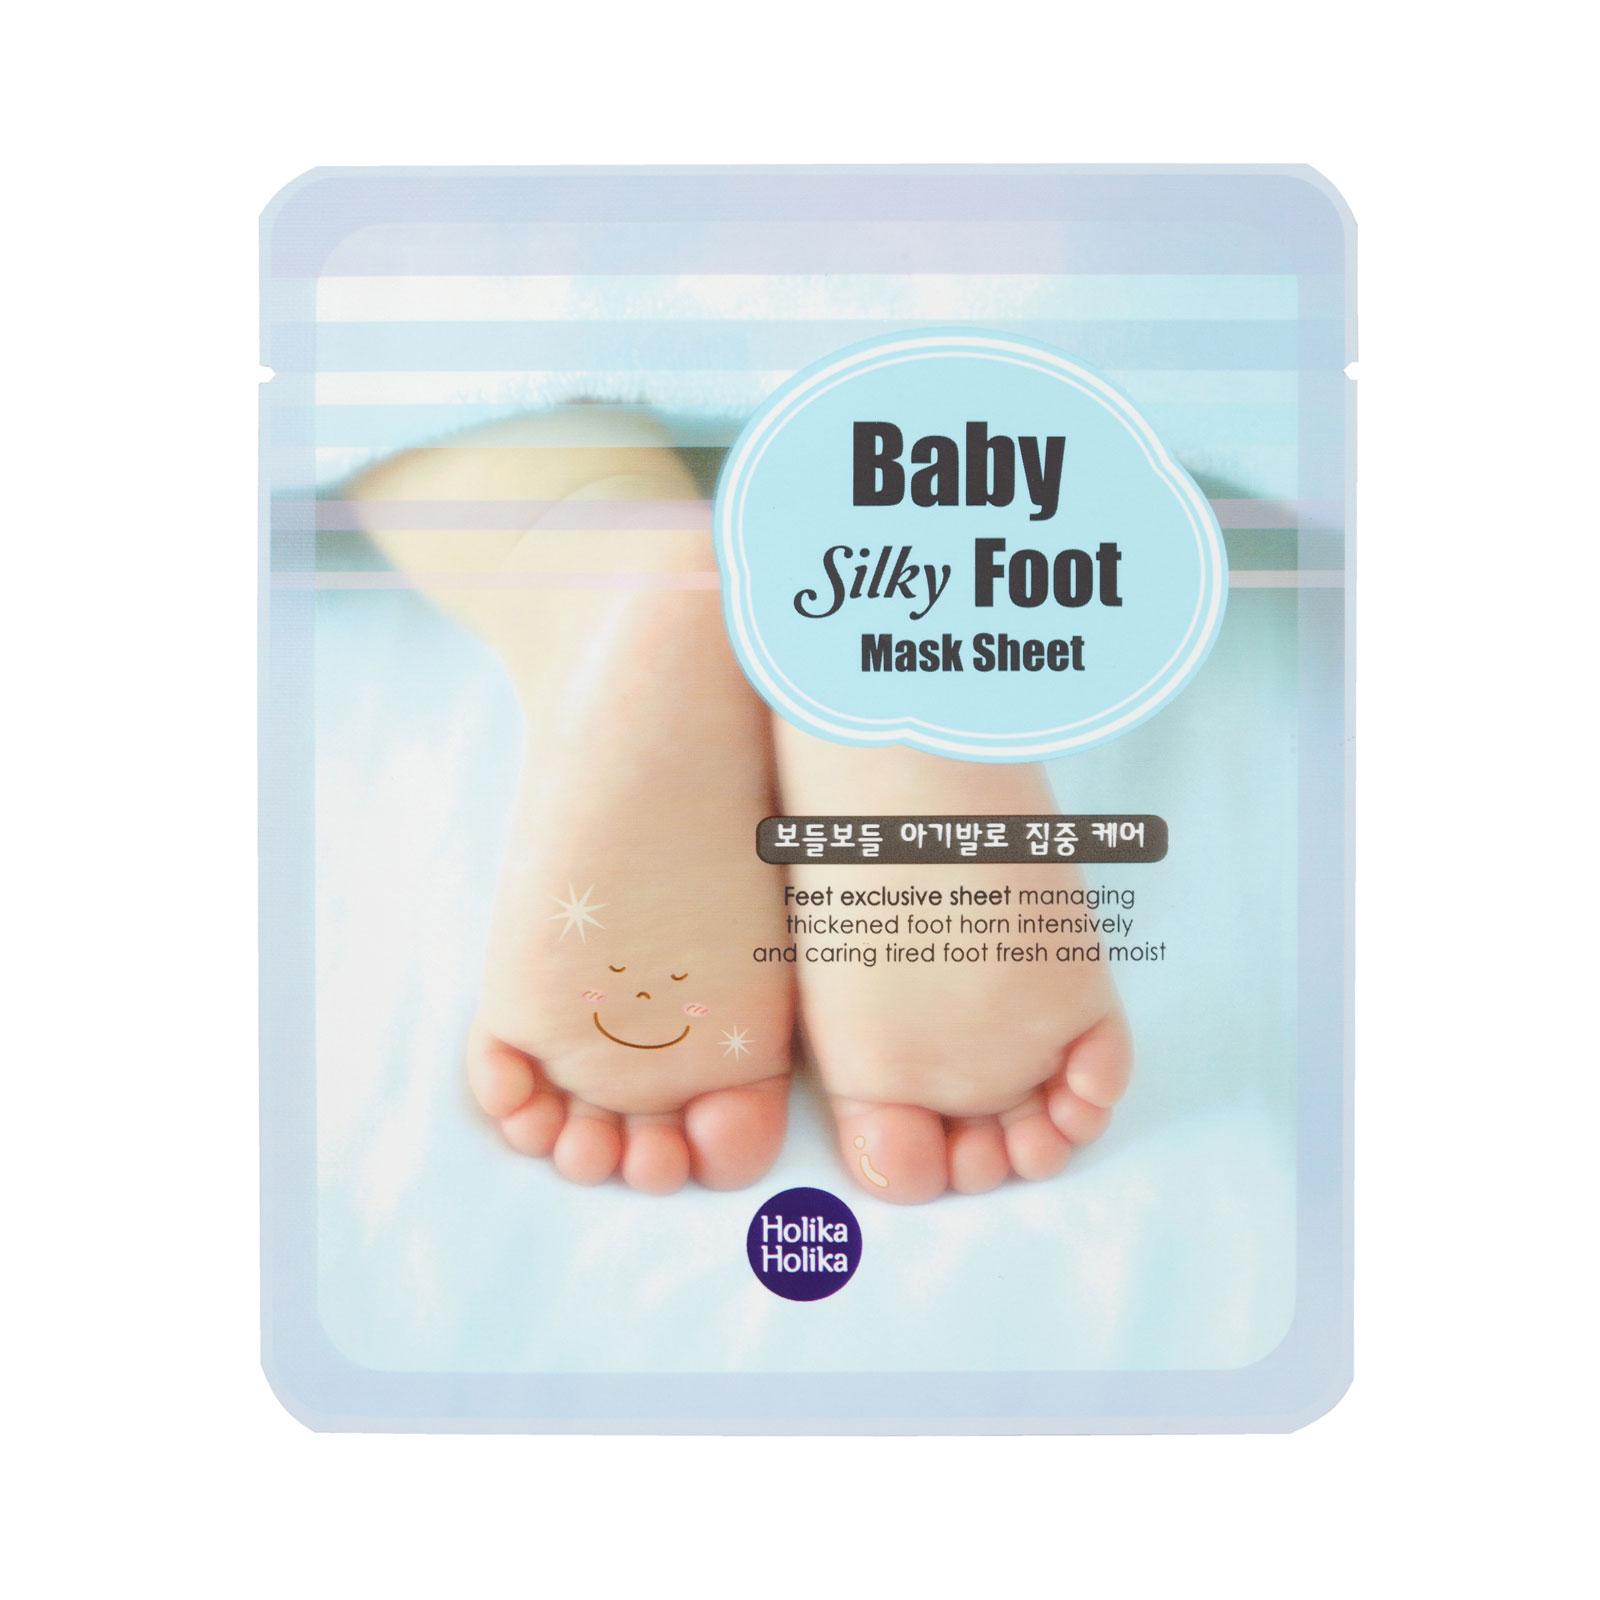 Маска для ног Holika Holika Baby Silky 2 шт по 18 мл<br>